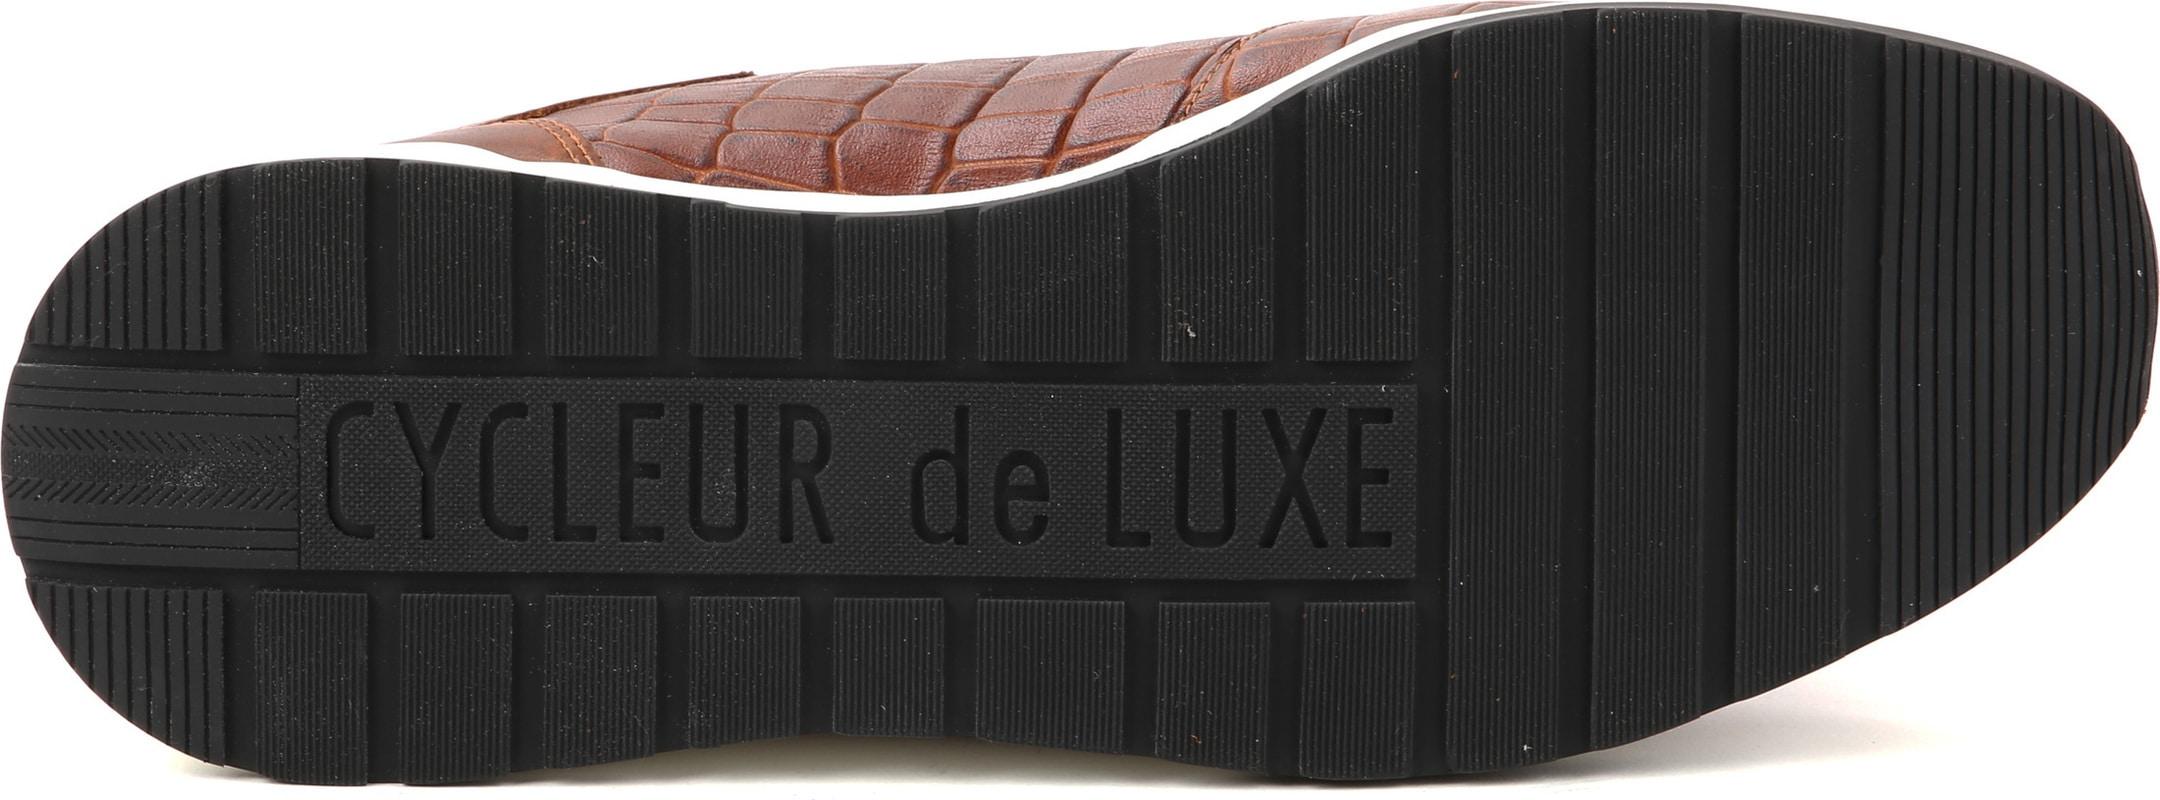 Cycleur de Luxe Sneaker Sanremo Cognac foto 3